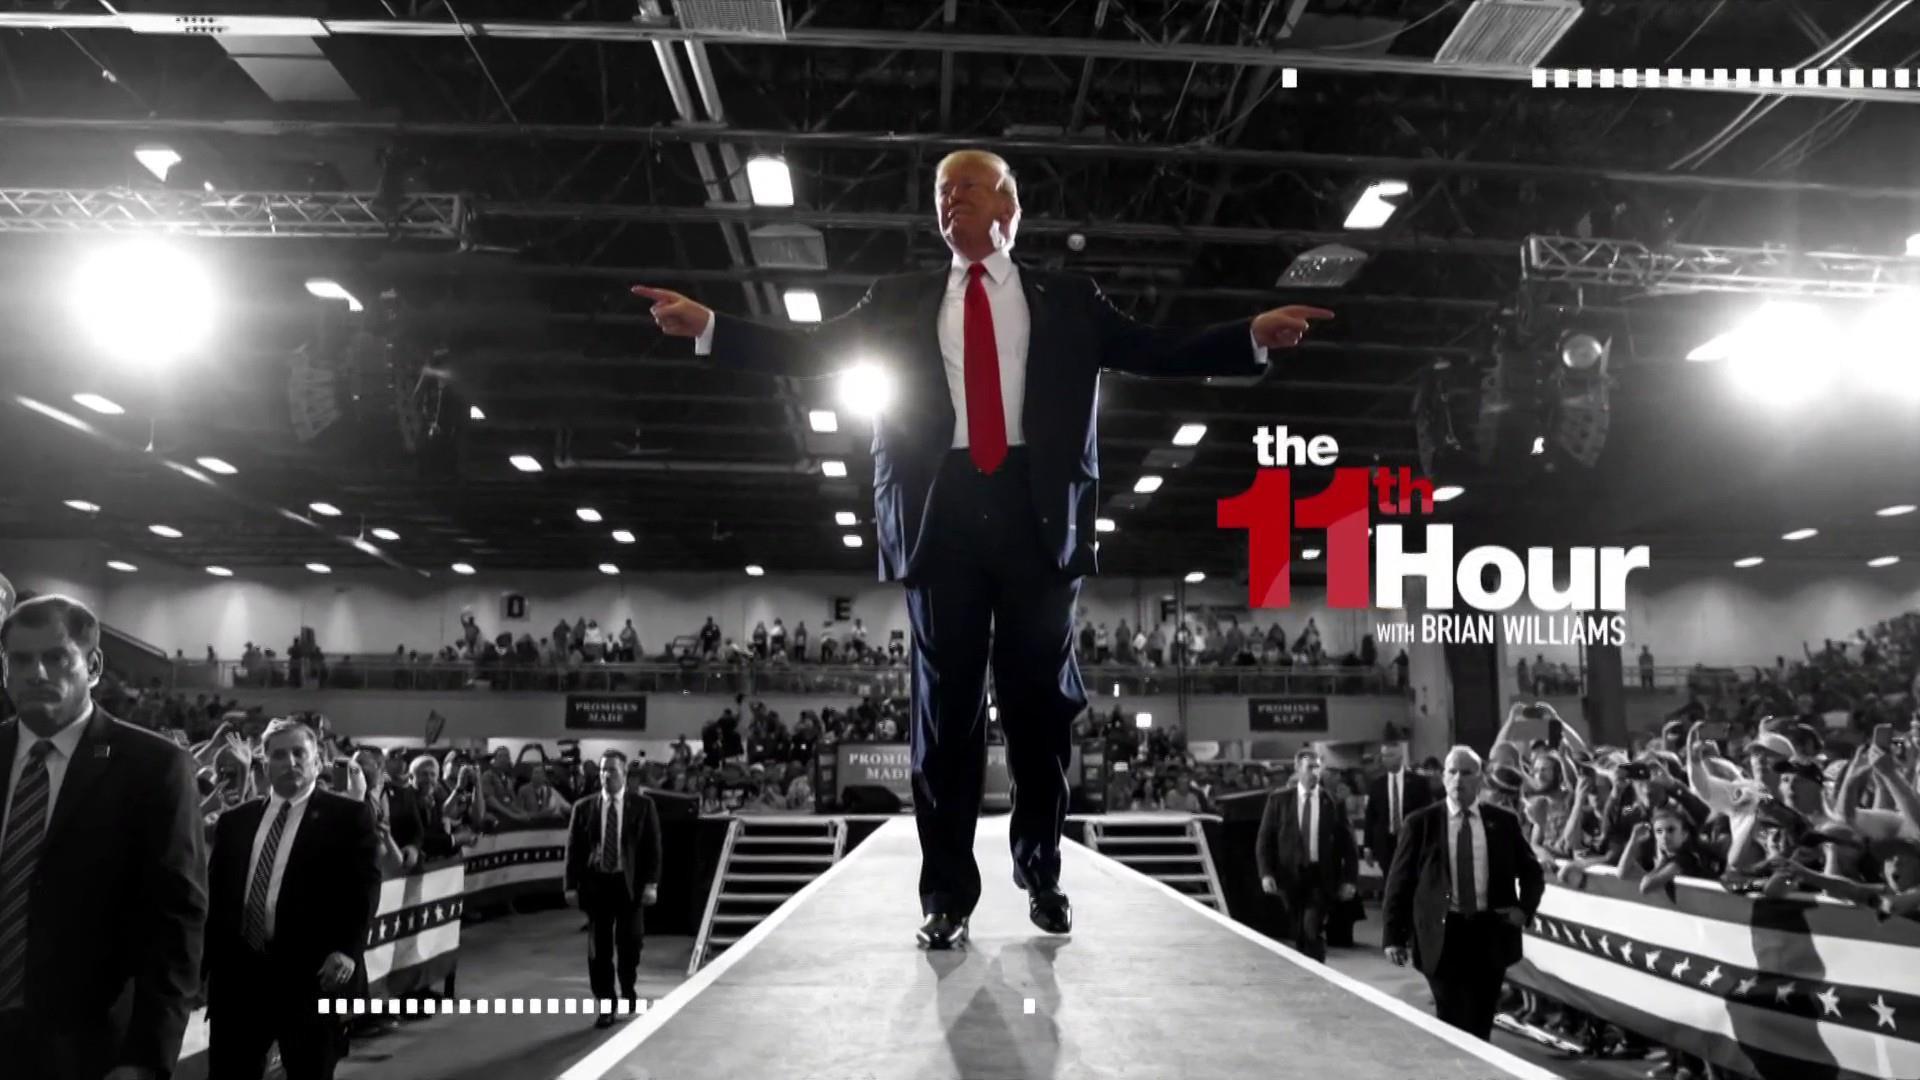 Trump's week ahead: SCOTUS pick, NATO summit, & Mueller probe